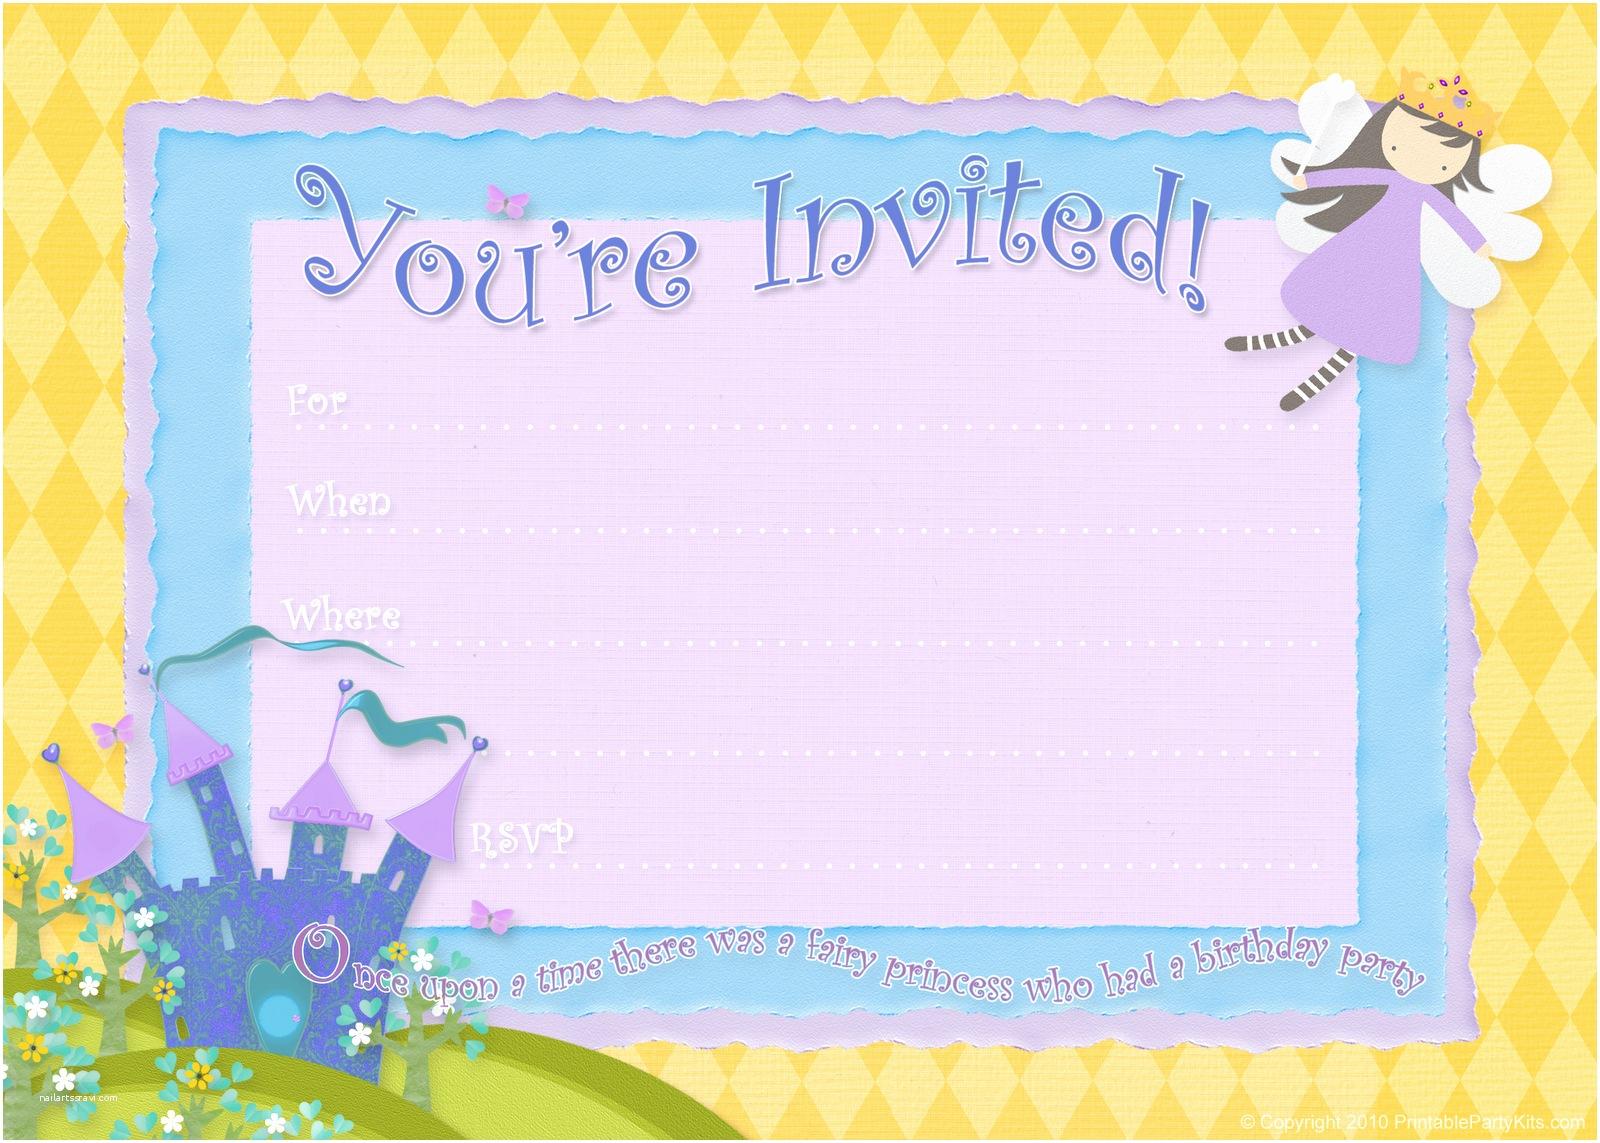 Free Party Invitations Free Birthday Party Invitations – Bagvania Free Printable